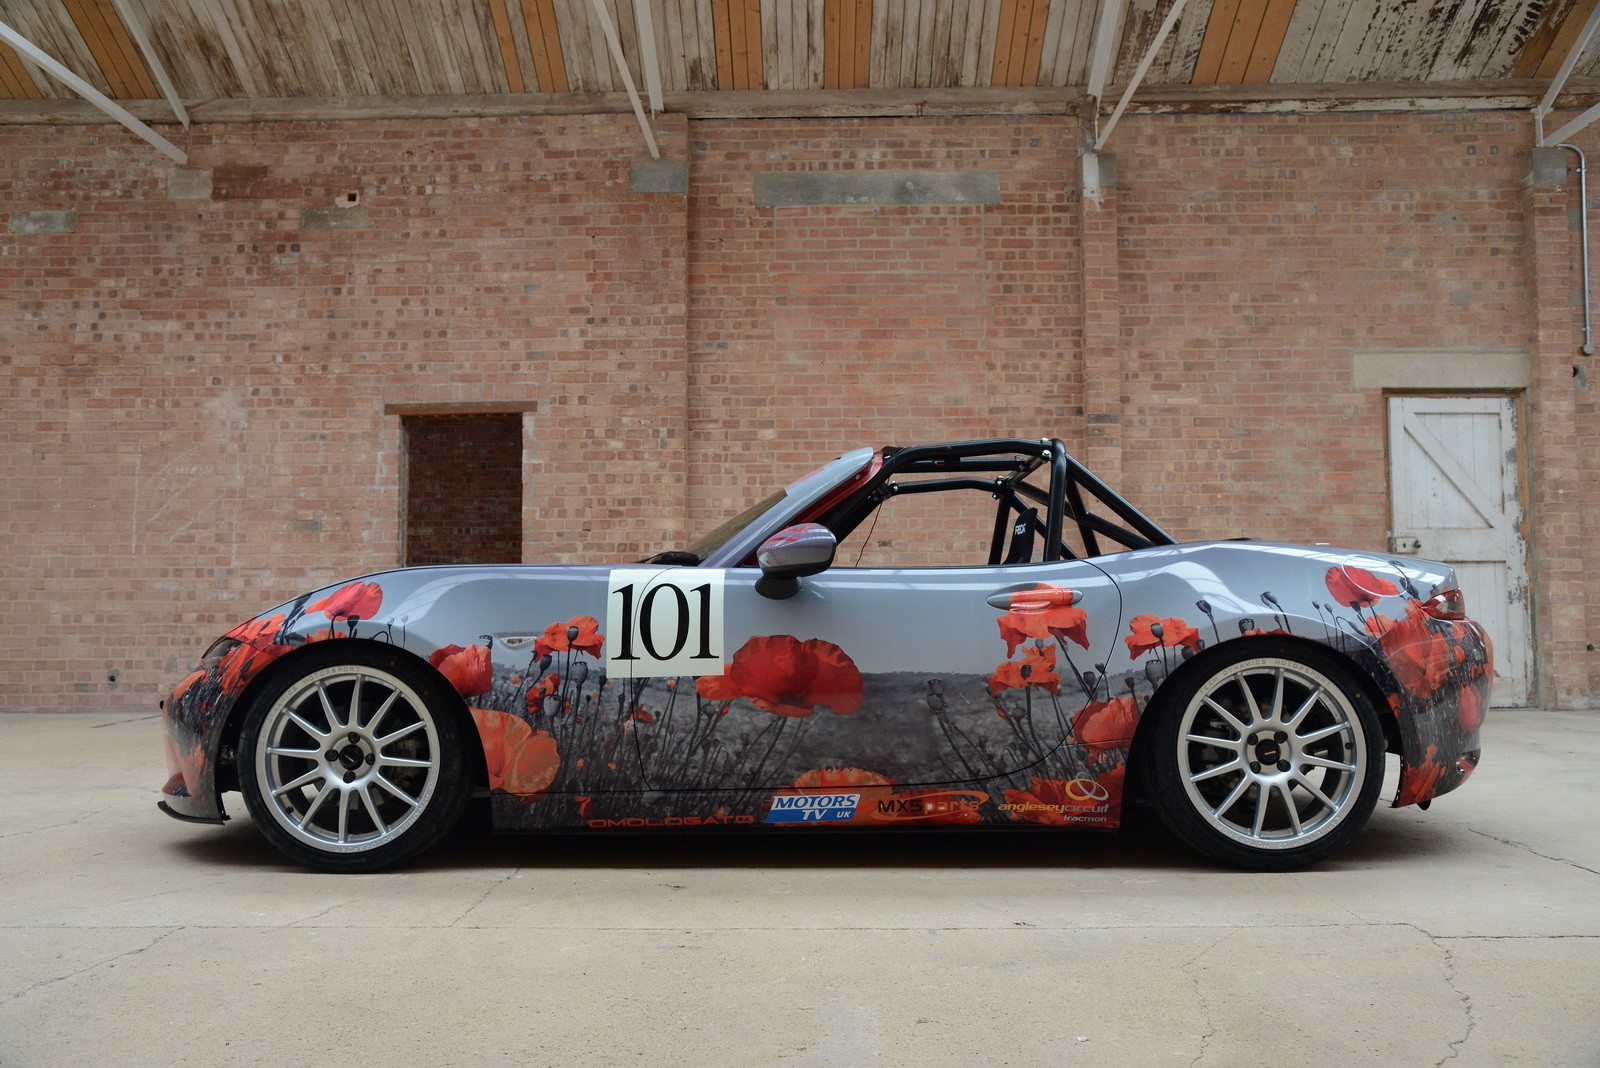 Miata Track Car >> 2016 Mazda MX-5 Miata with Poppy Art Car Livery Isn't Just for Show - autoevolution